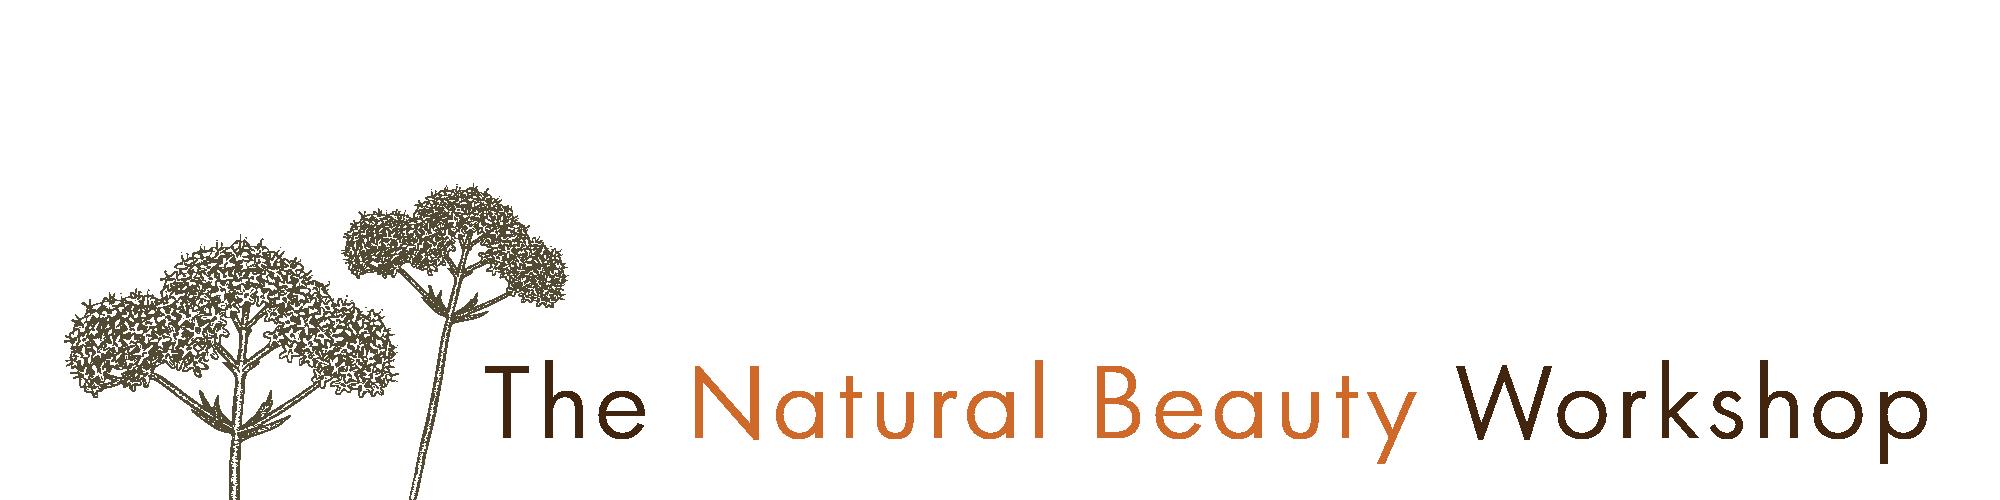 Blog The Natural Beauty Workshop Mary Helen Leonard